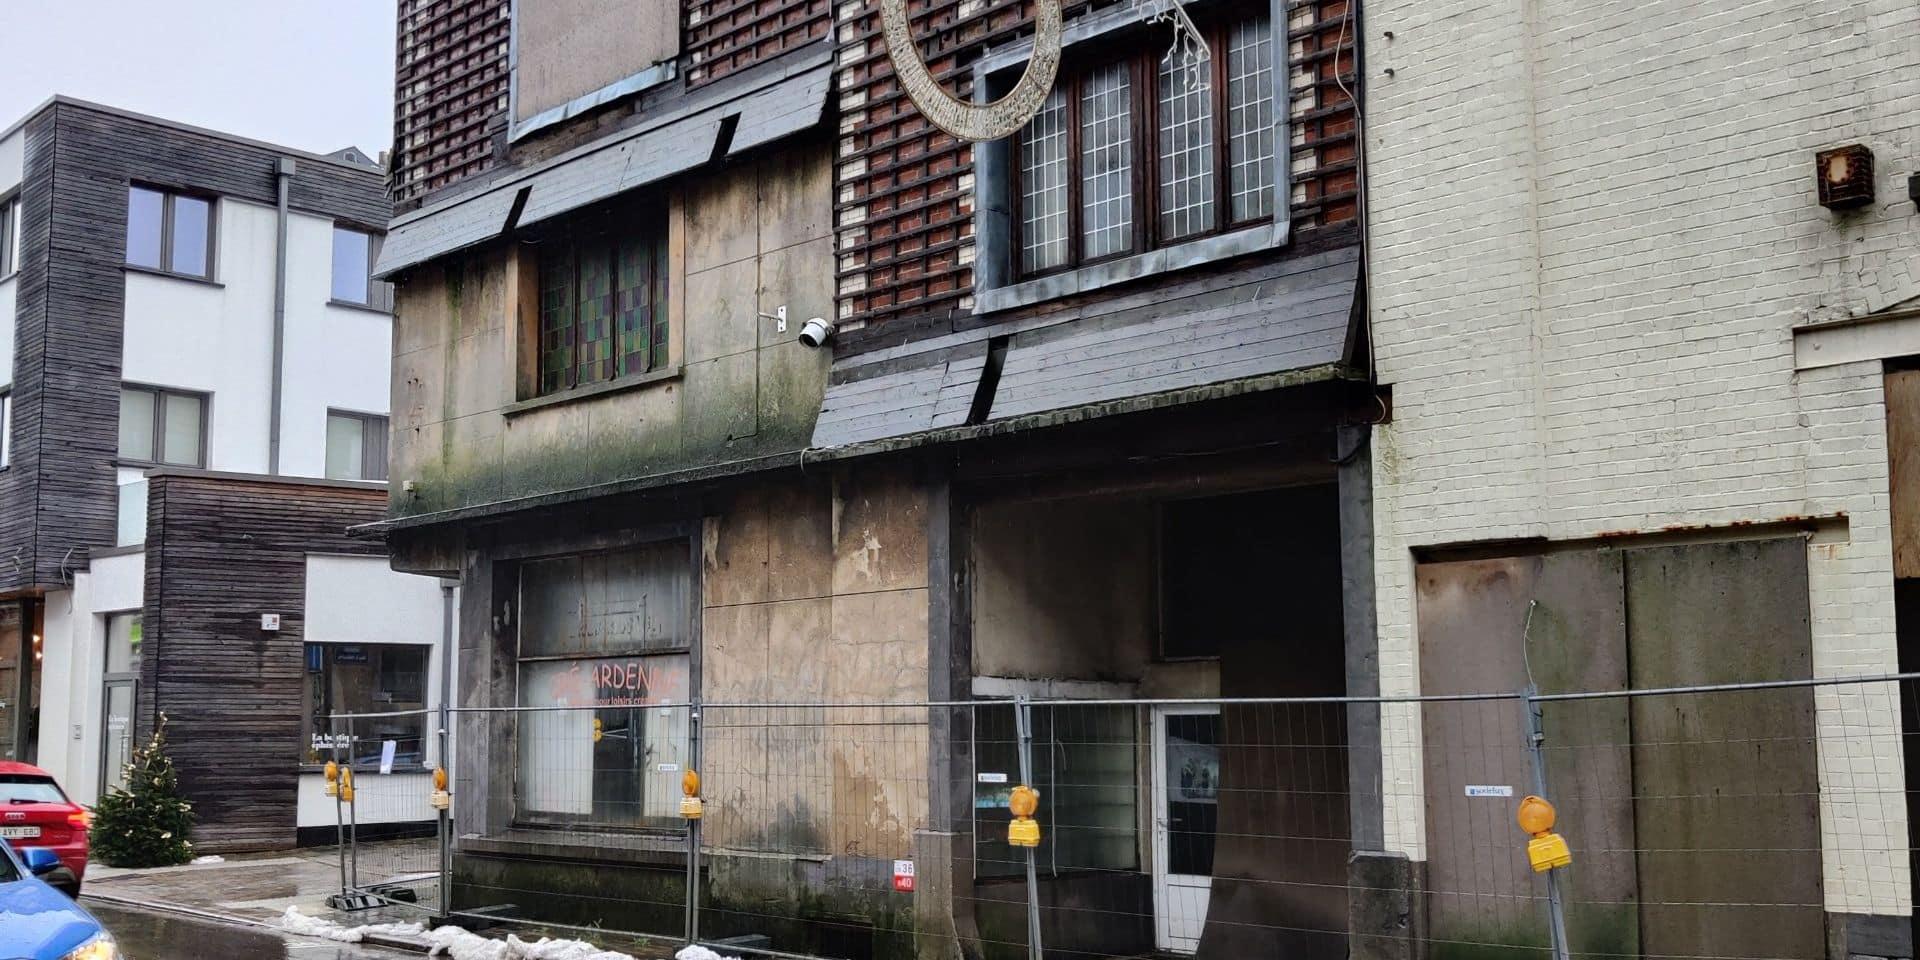 Neufchâteau : quid de l'immeuble Ianuzzi/Laroche à Neufchâteau ?